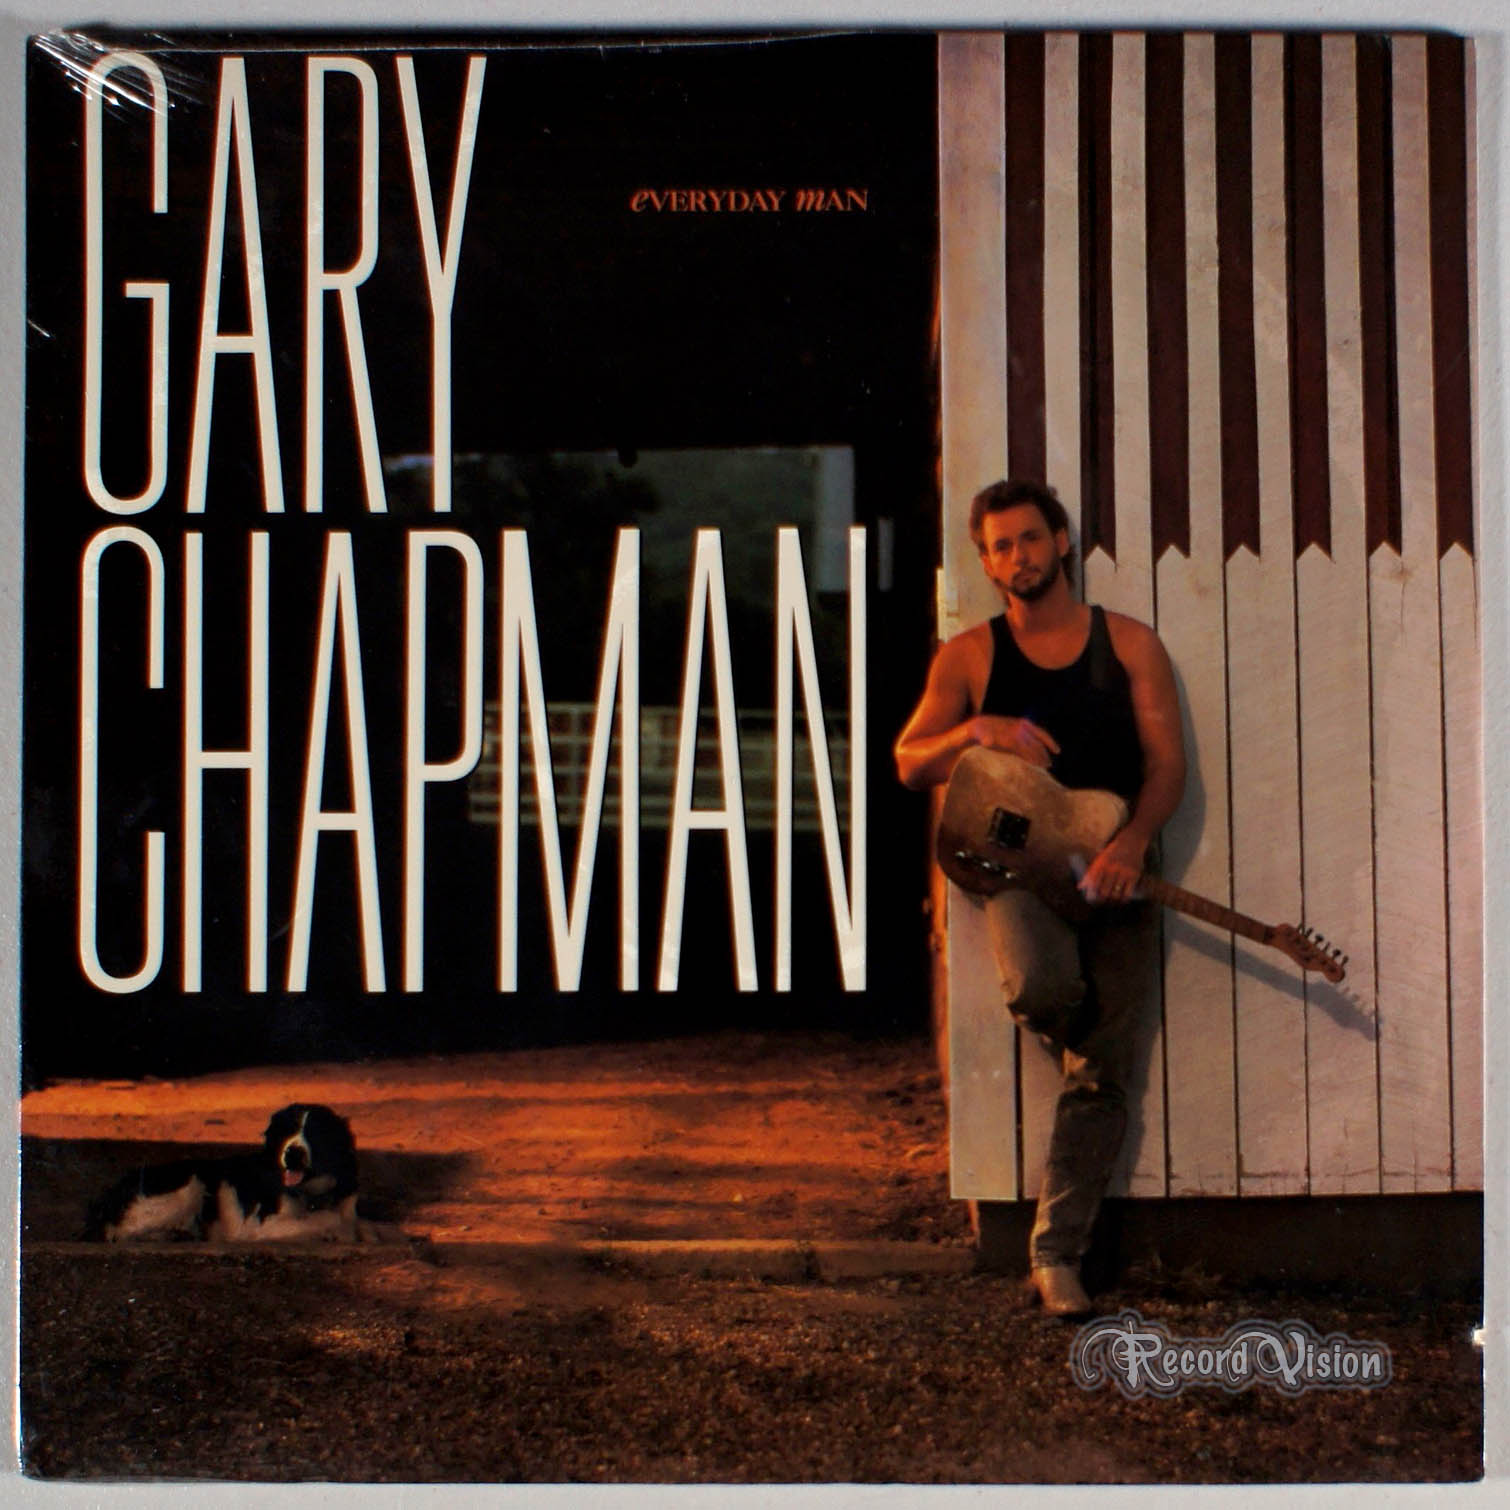 GARY CHAPMAN - Everyday Man - 33T